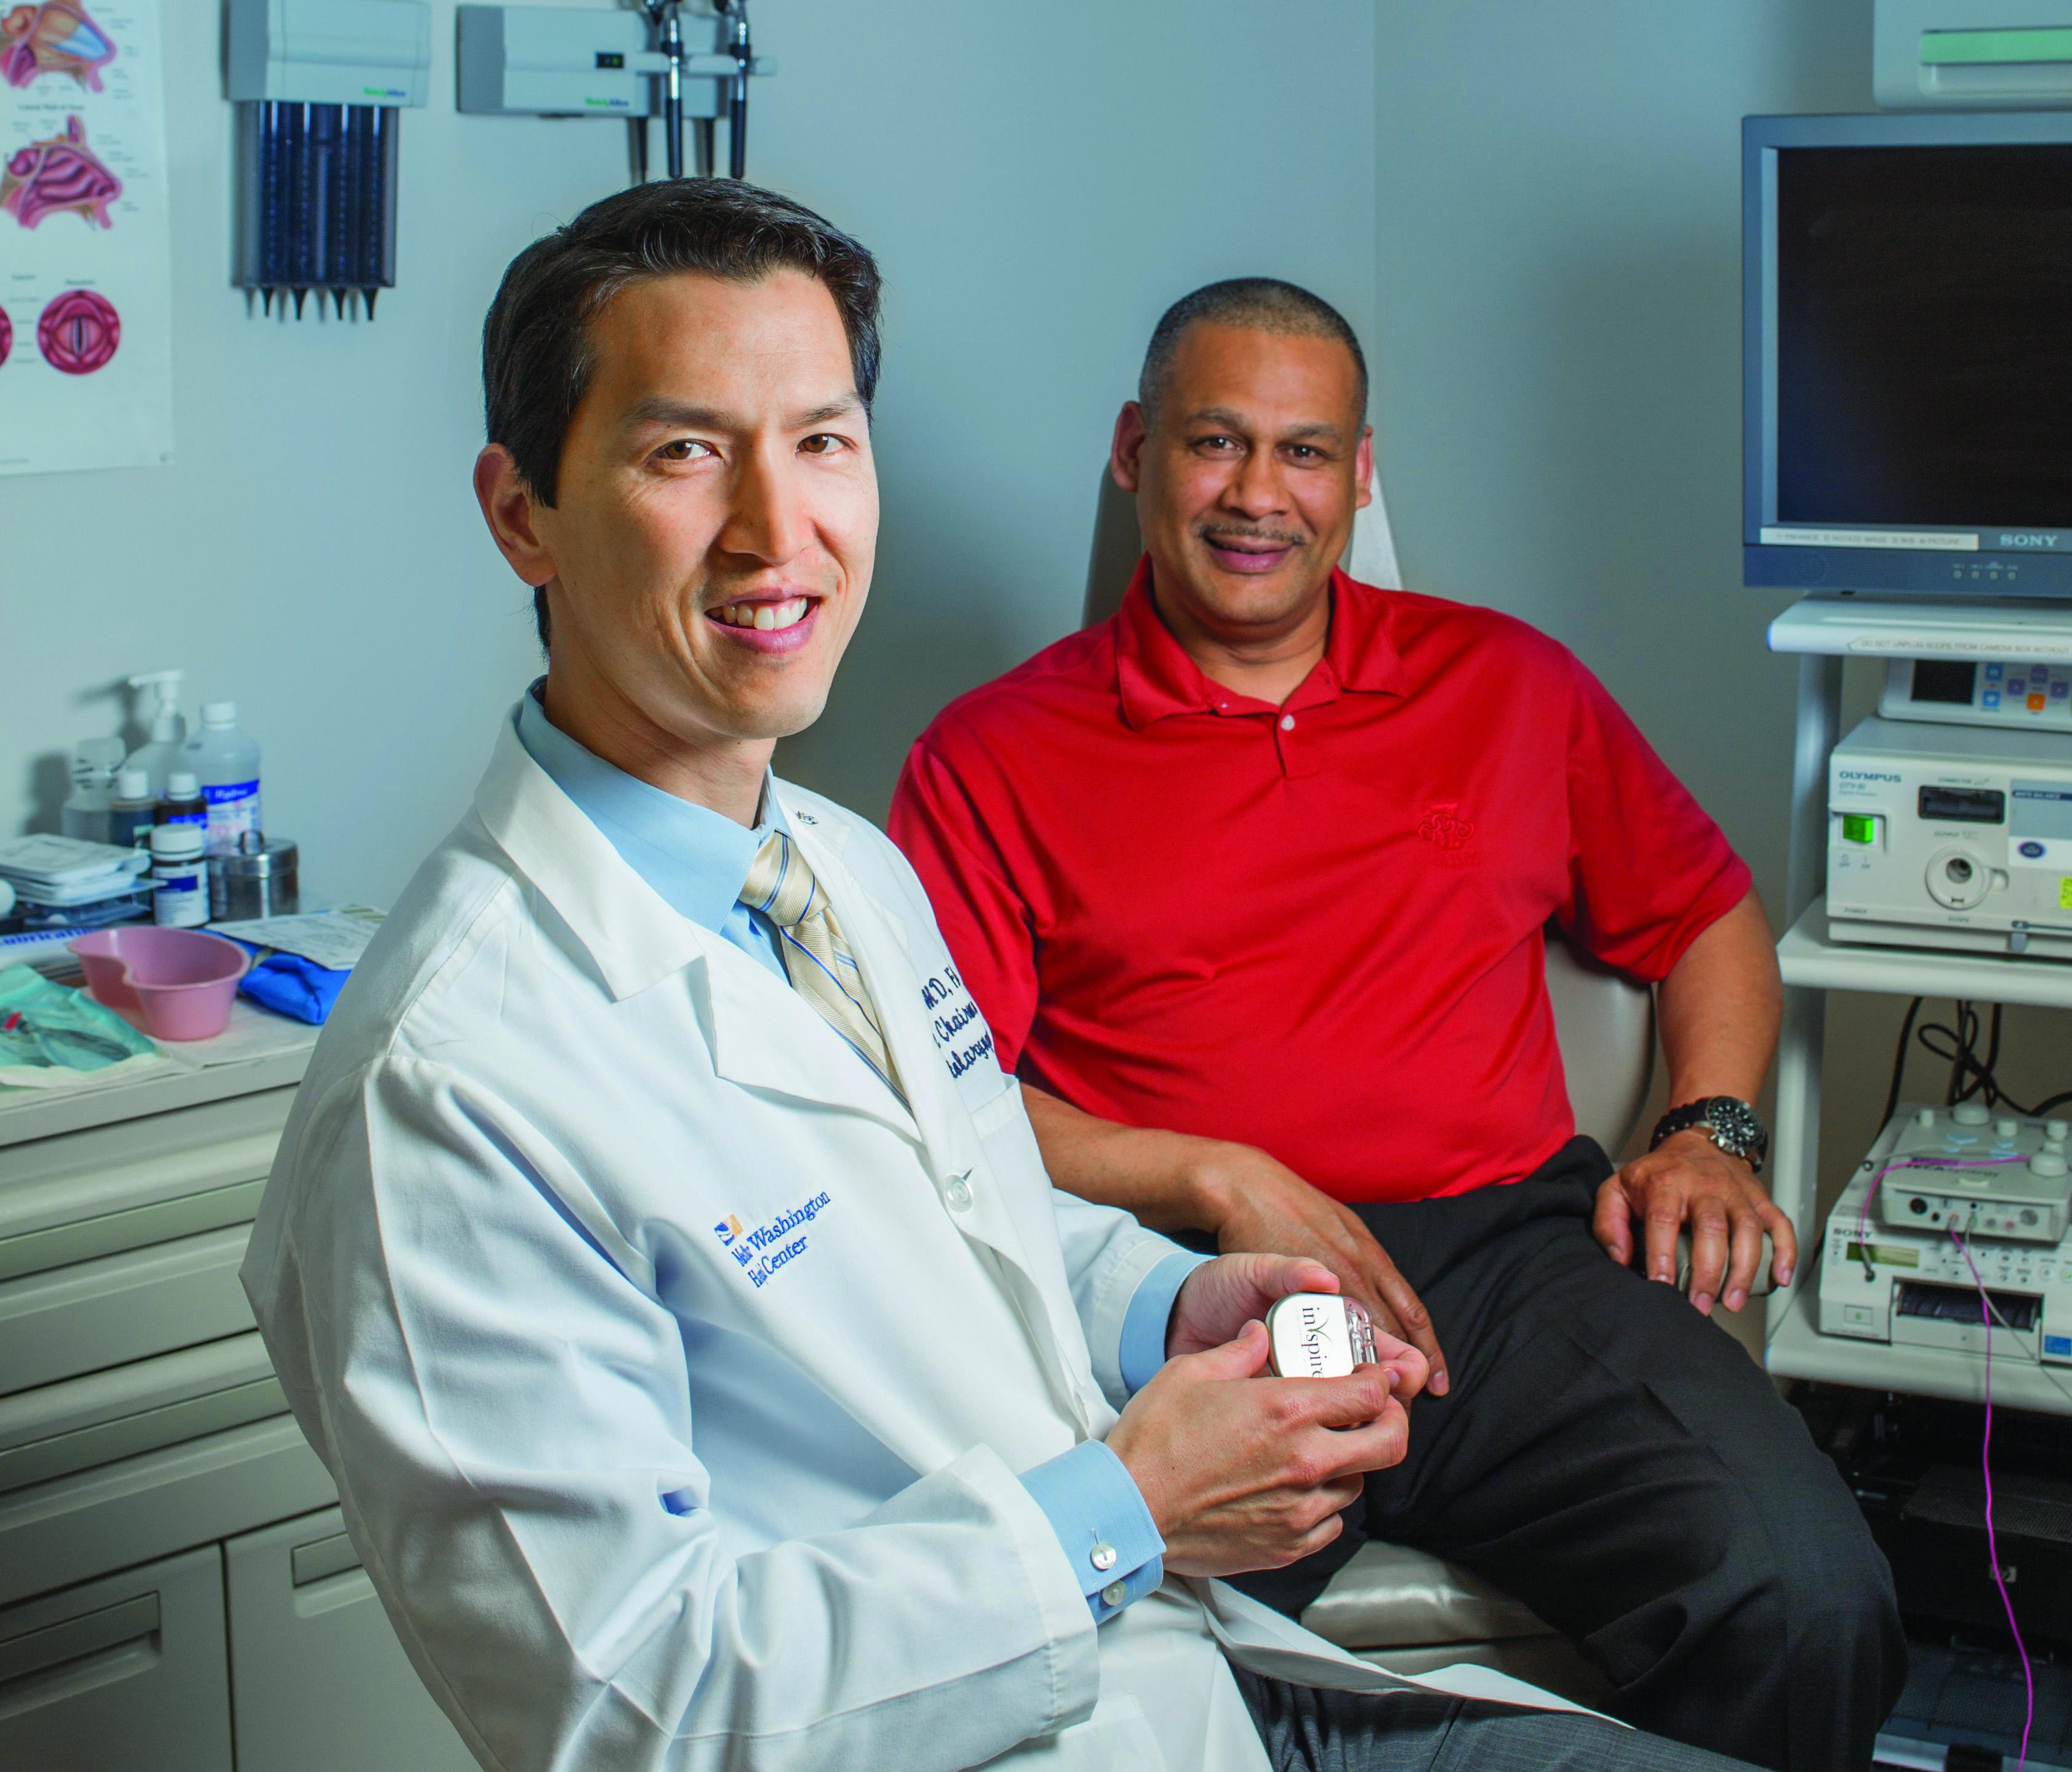 New relief for sleep apnea sufferers